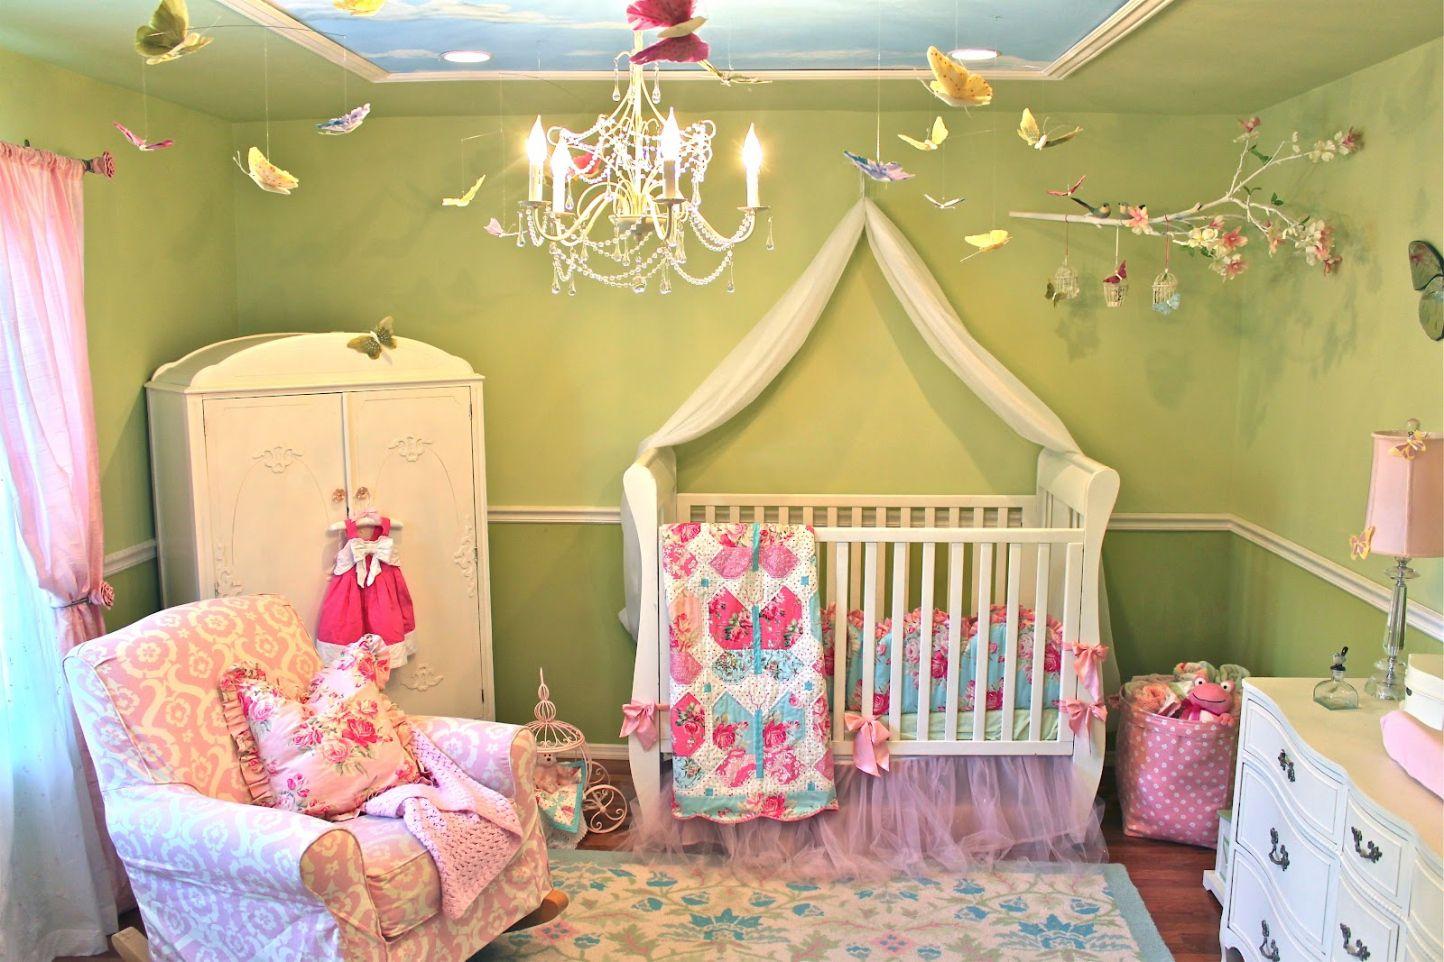 Disney Baby Room Themes